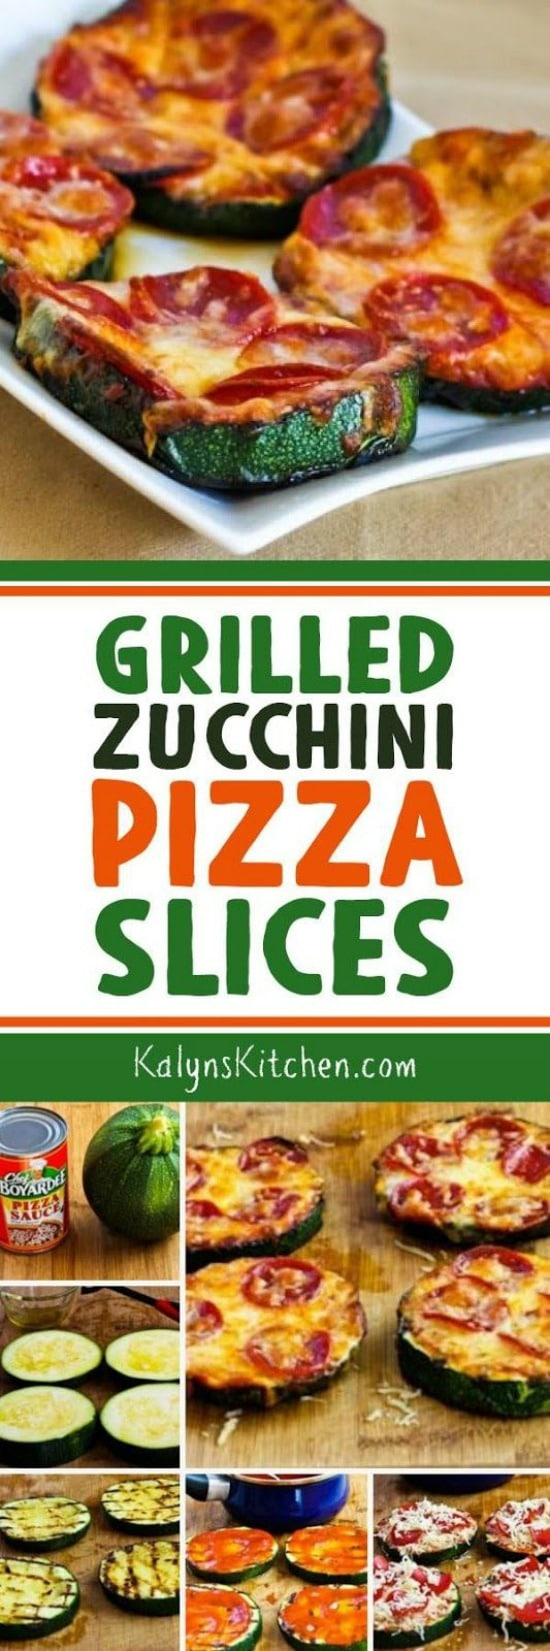 Grilled Zucchini Pizza Slices found on KalynsKitchen.com